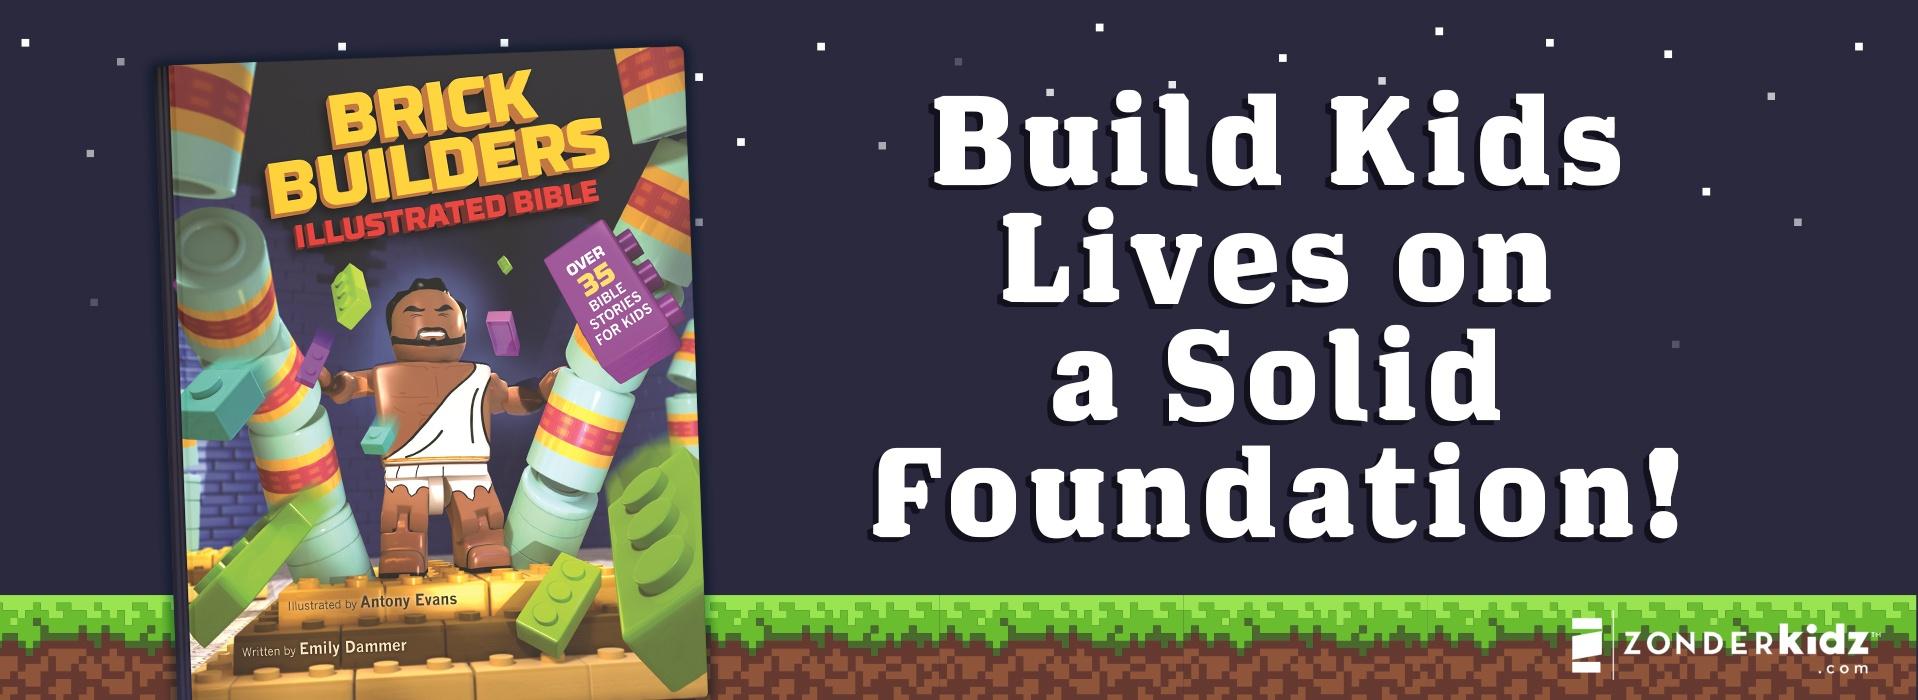 BrickBuilders_LandingPageHdr1